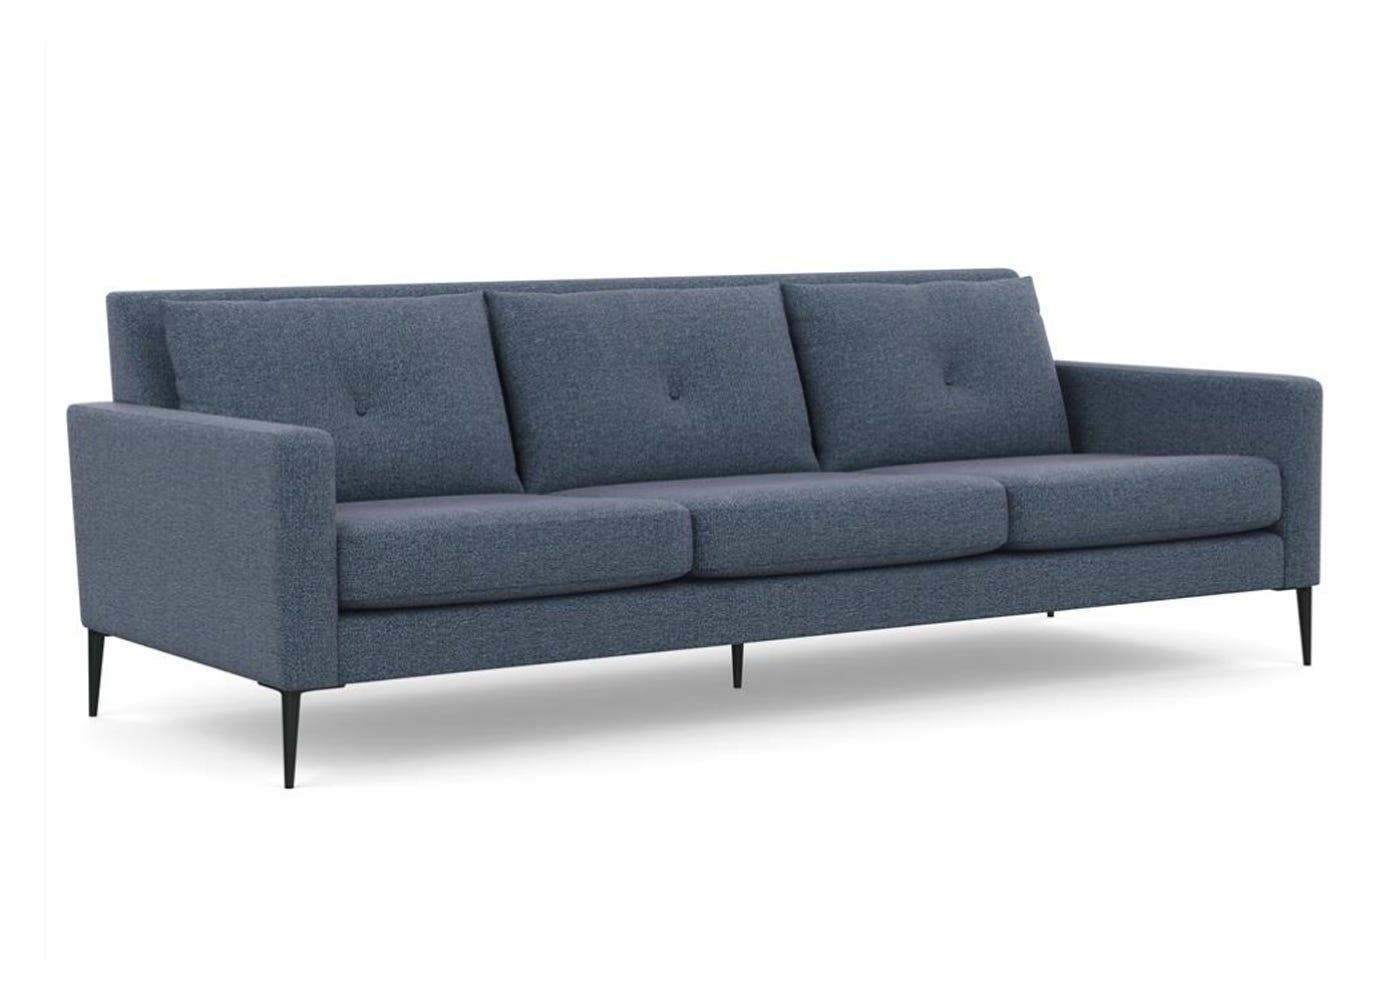 Brunel 4 Seater Sofa | HEAL